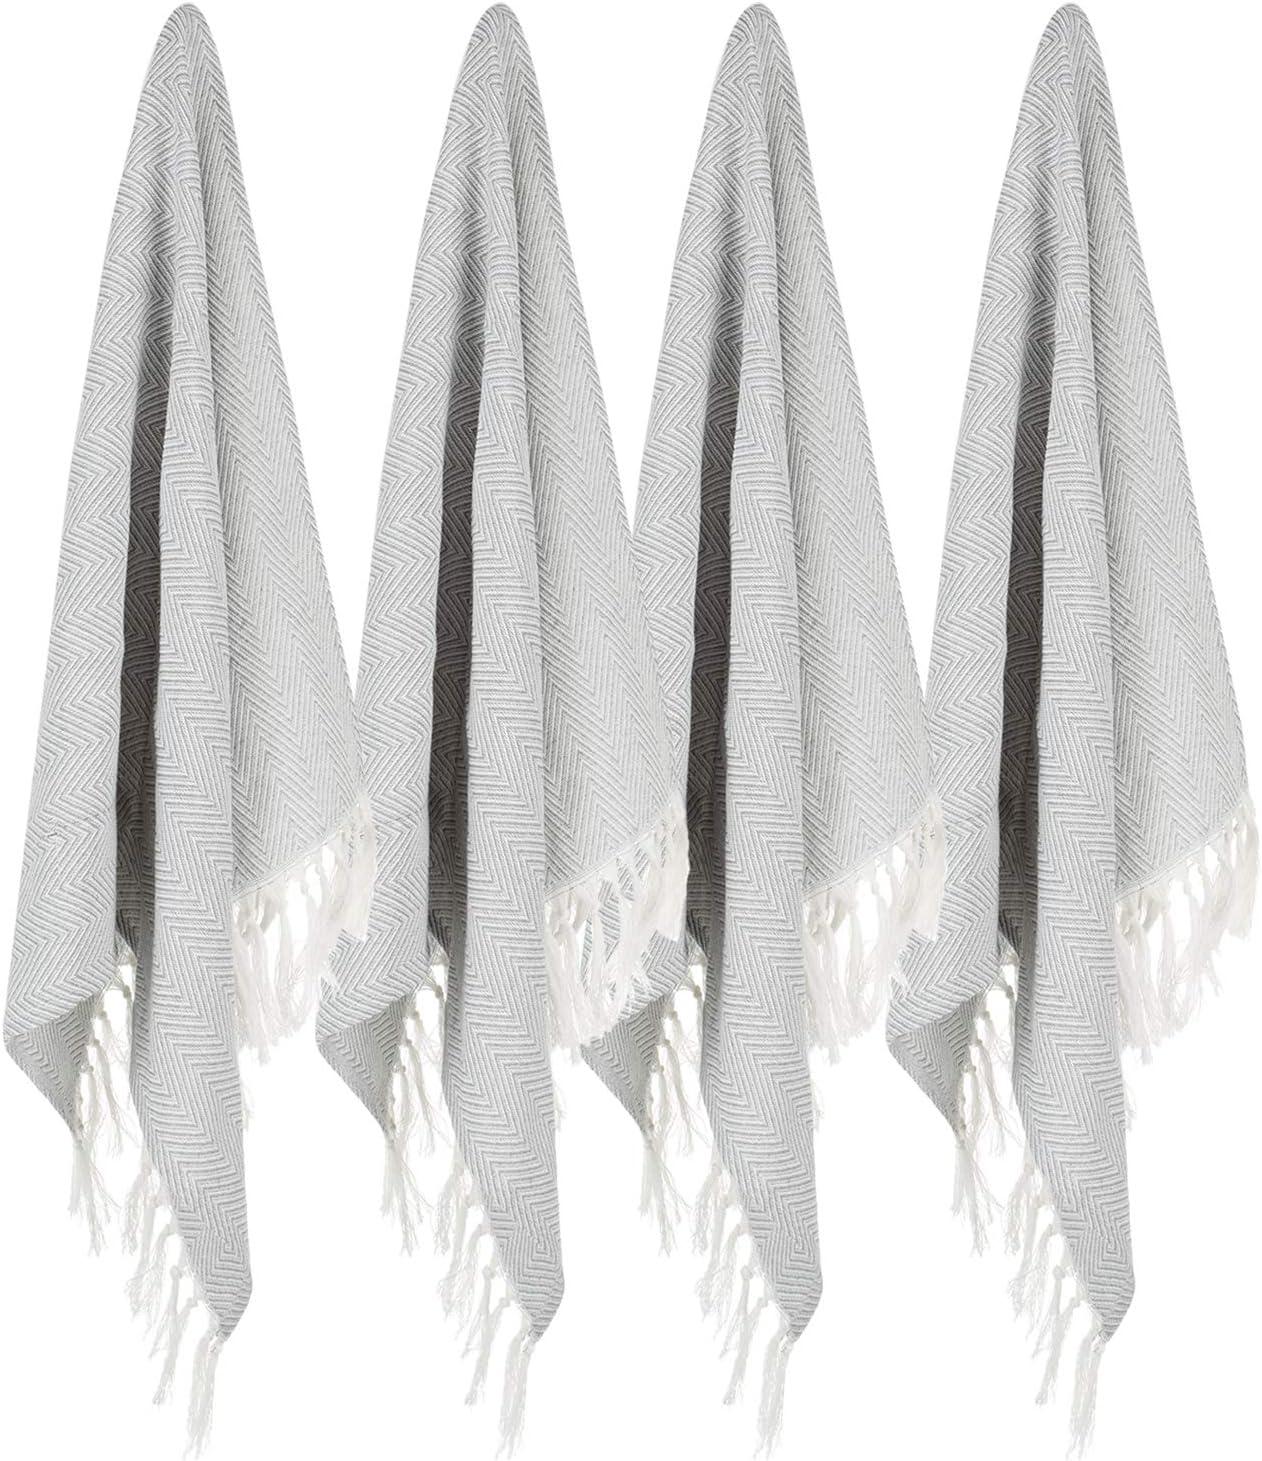 100% Cotton Hand Face Head Guest Gym Towel Set Washcloth Kitchen Tea Towel Dish Cloth Set of 4 Light Grey